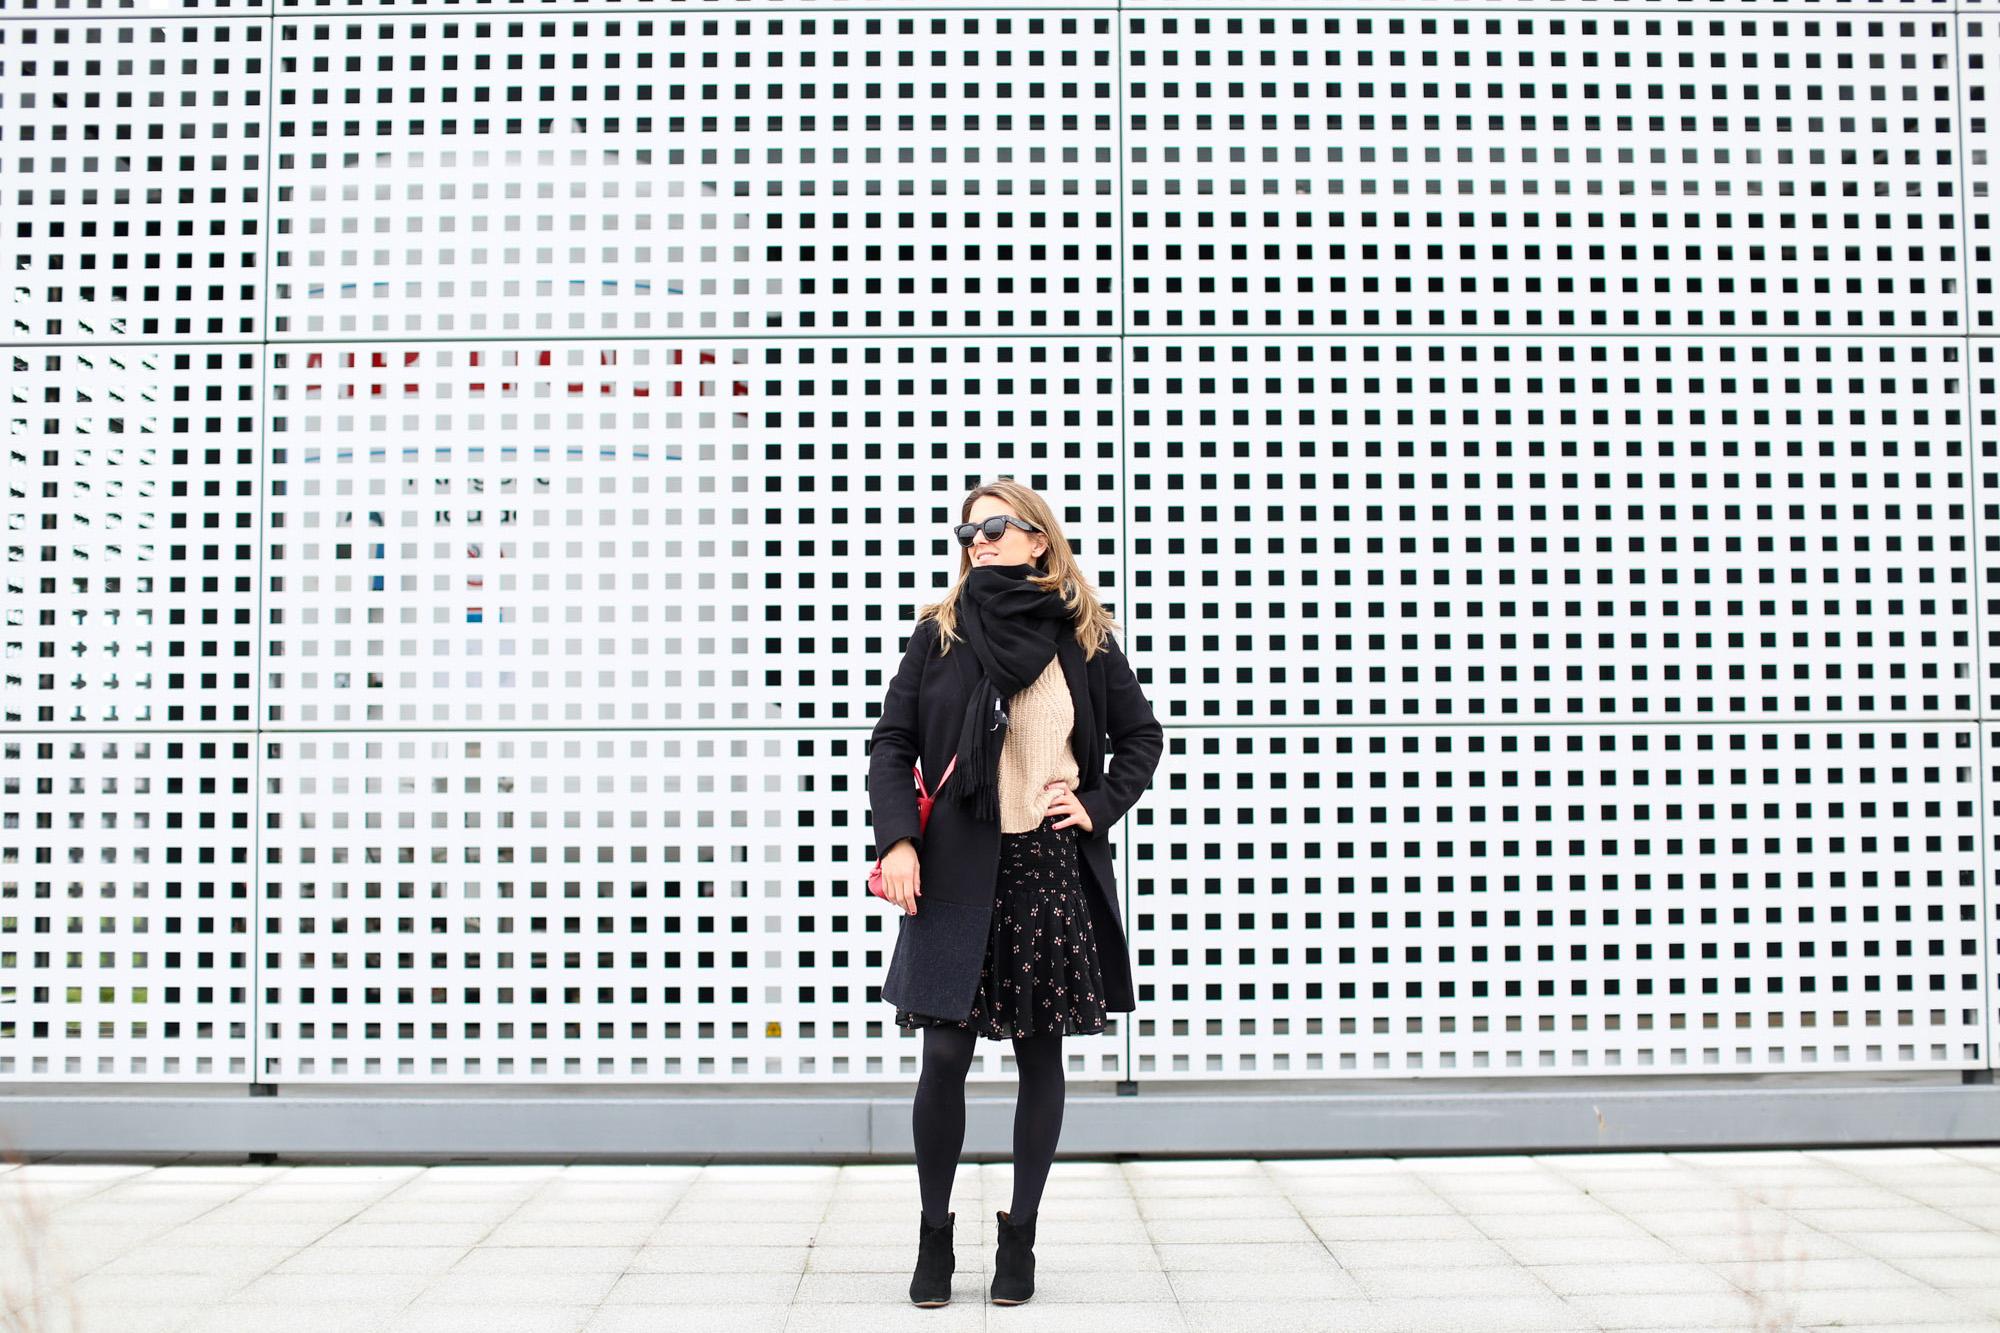 Clochet_streestyle_fashionblogger_minifaldafruncidamaje_botinesdickerIsabelMarant_bolsominiparadisredtitamadrid